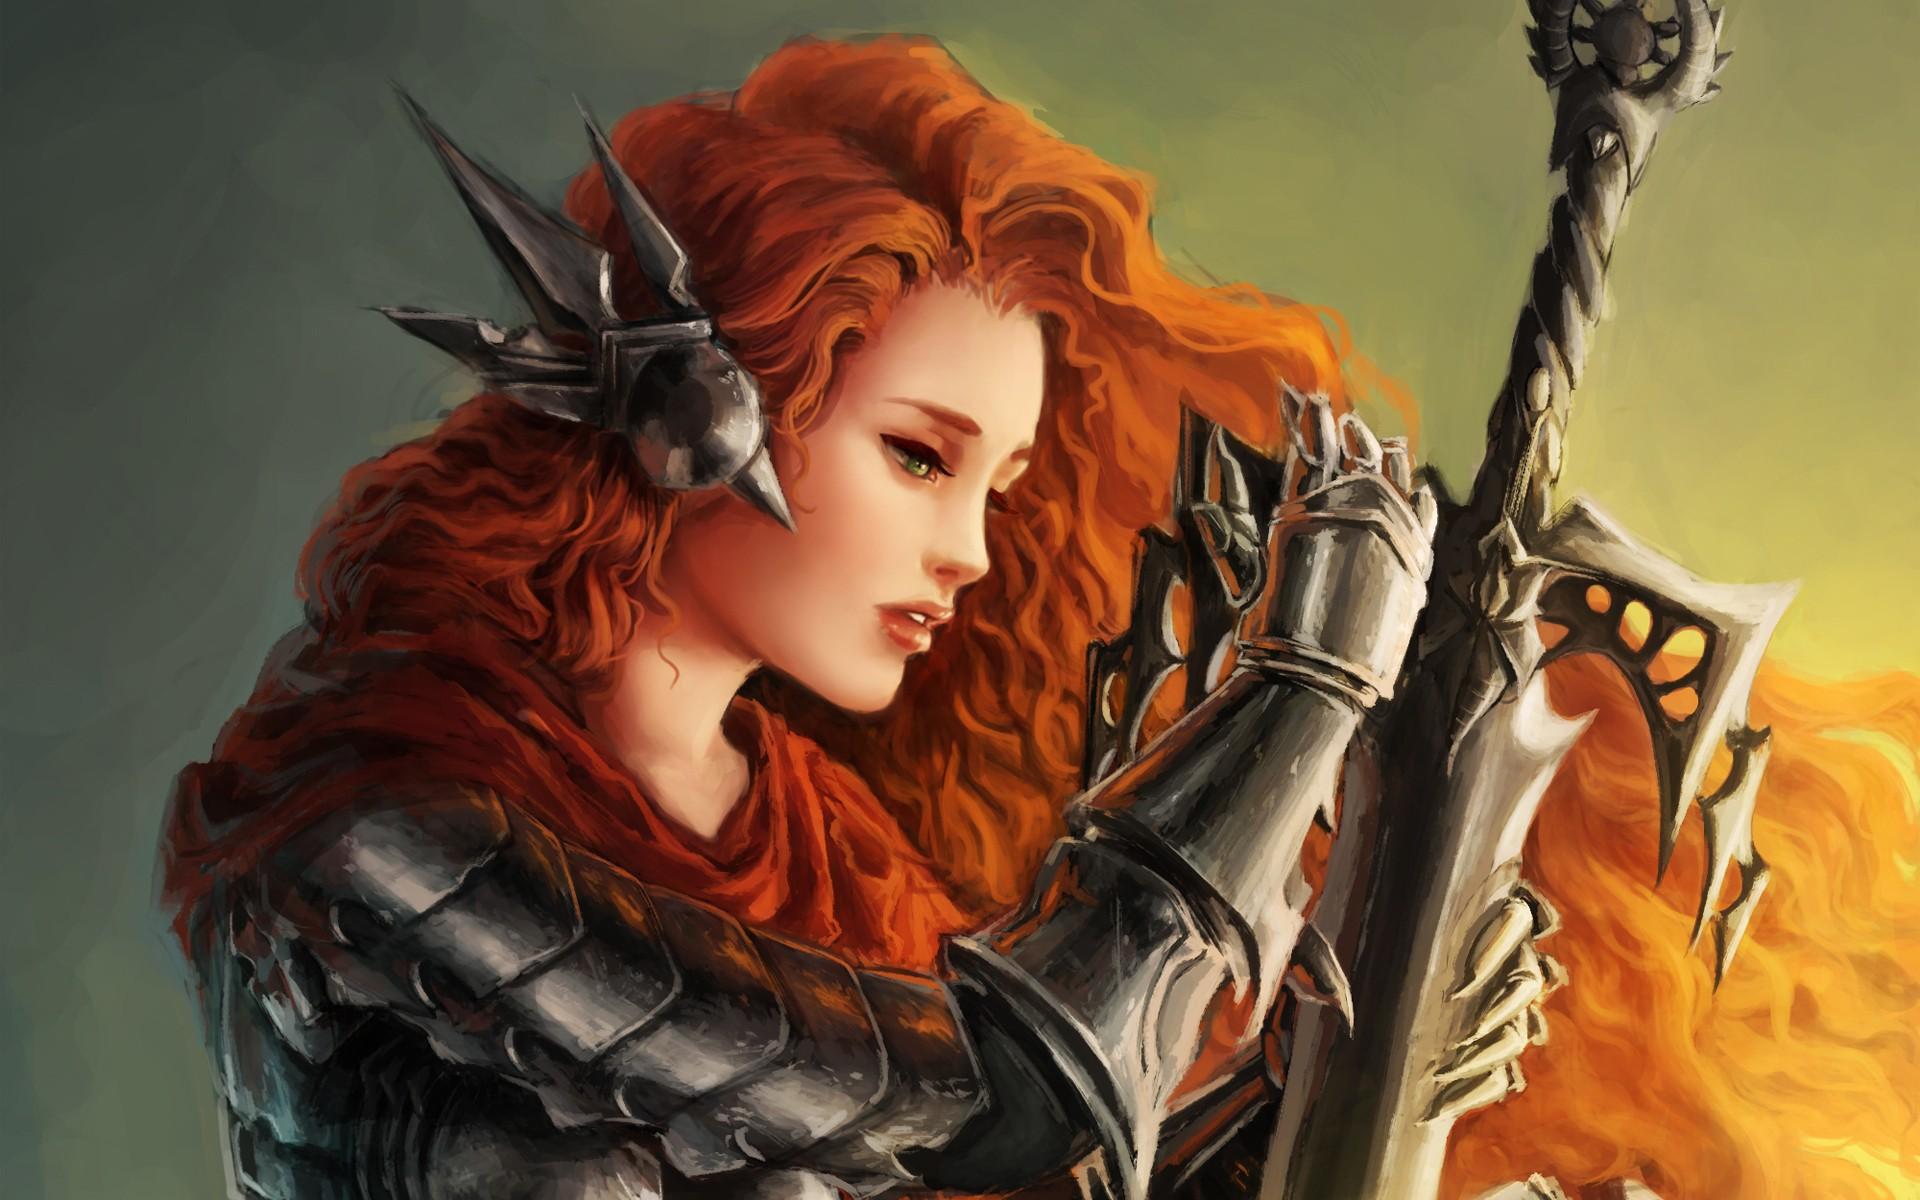 Women fantasy art armor artwork warriors orange hair - Fantasy female warrior artwork ...